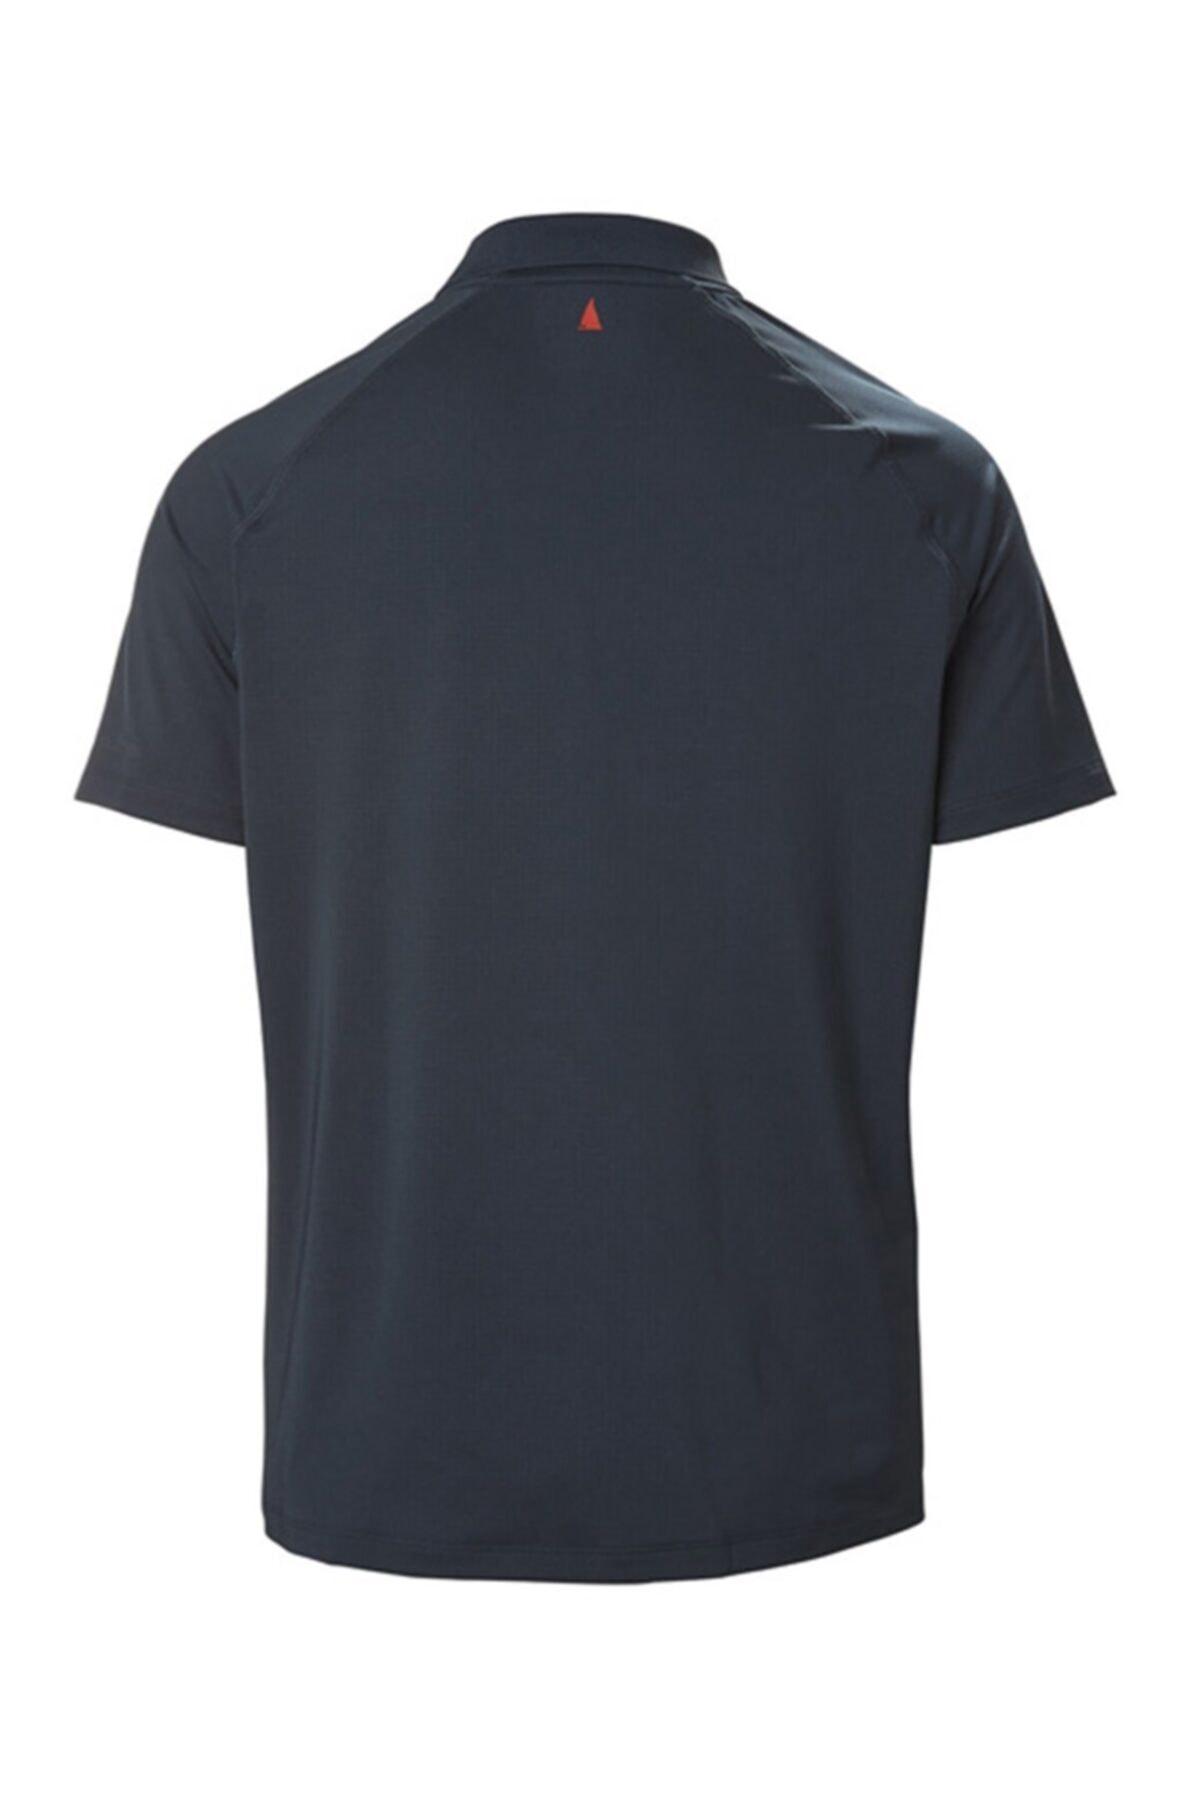 Musto Erkek Lacivert Evo Sunblock Ss Polo Tshirt 2.0 2